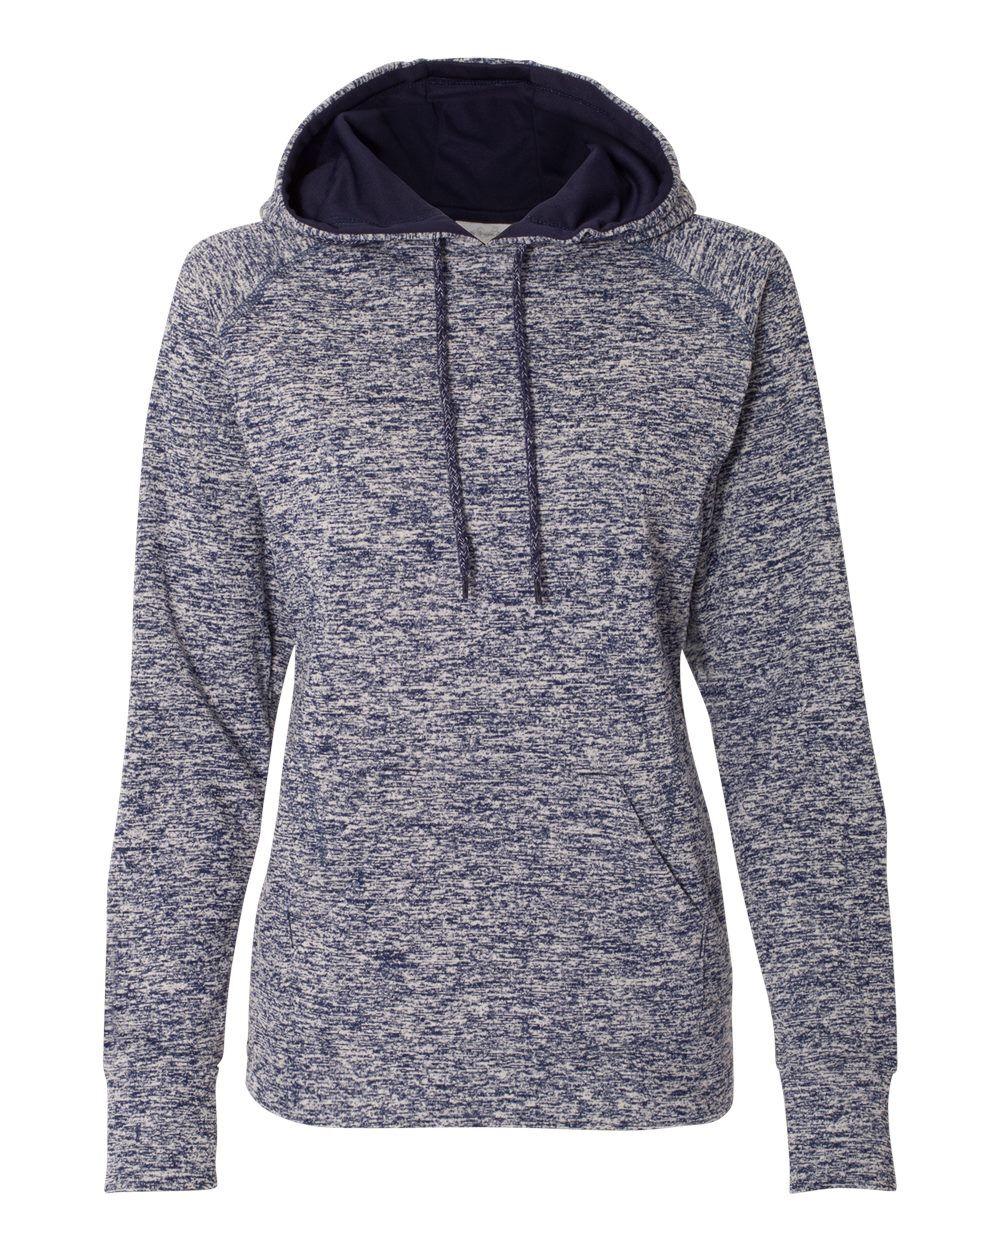 J. America - Womens Cosmic Fleece Hooded Sweatshirt - 8616 - Navy Fleck/ Navy - Small